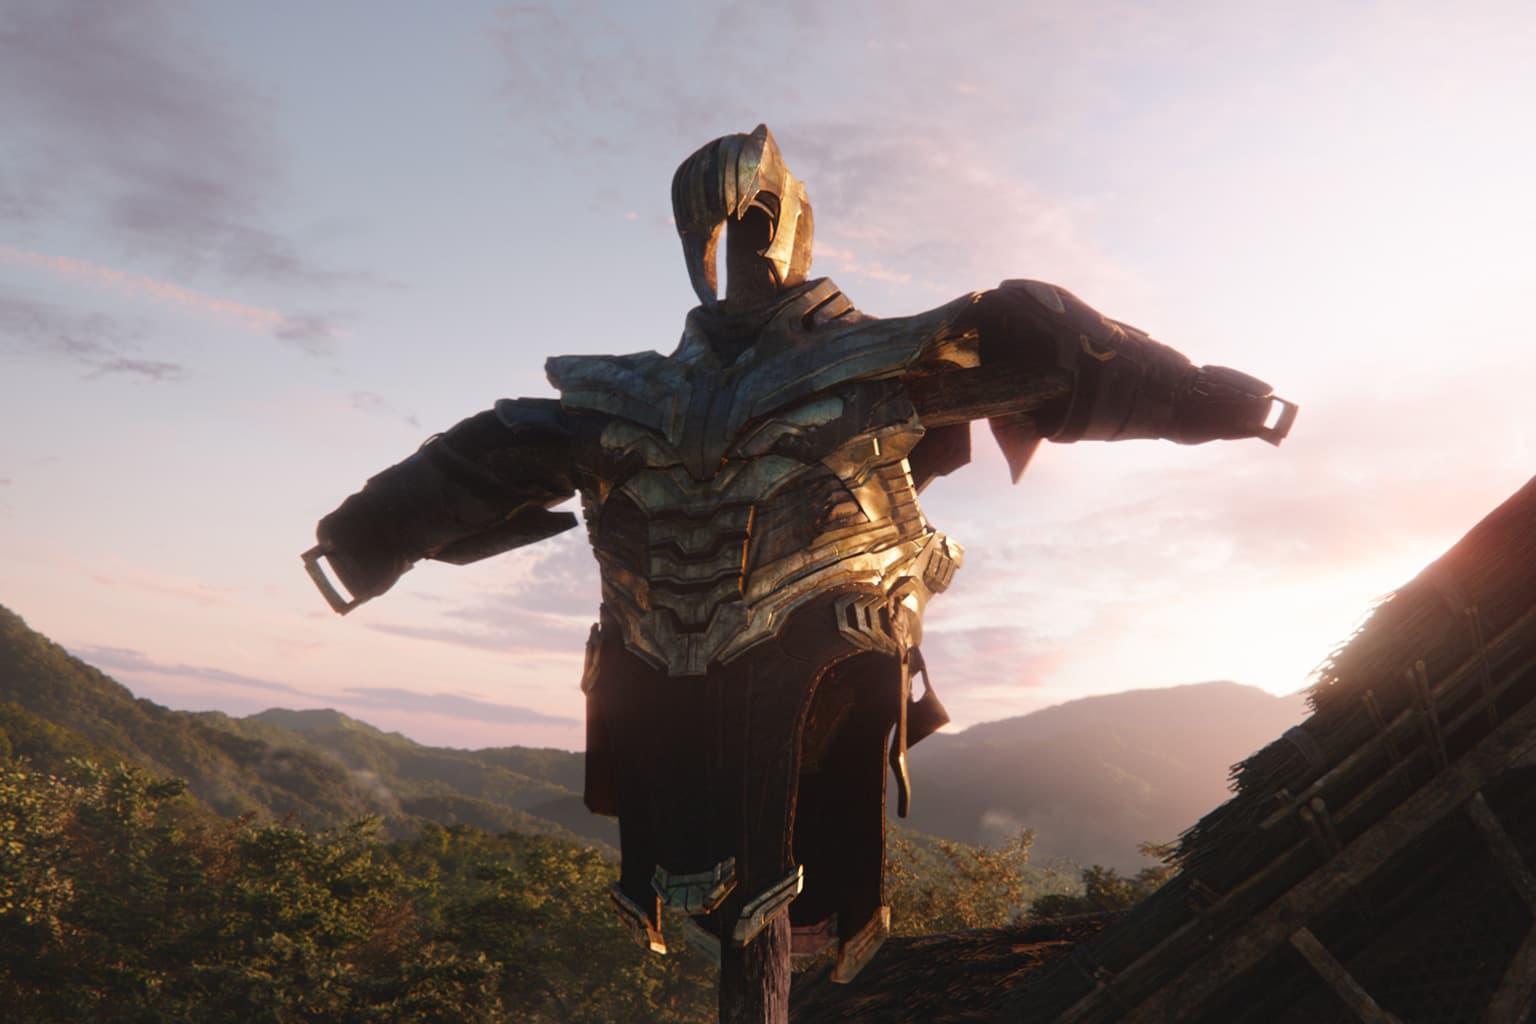 'Avengers: Endgame' Directors Pen Letter to Fans Asking Not to Spoil the Movie